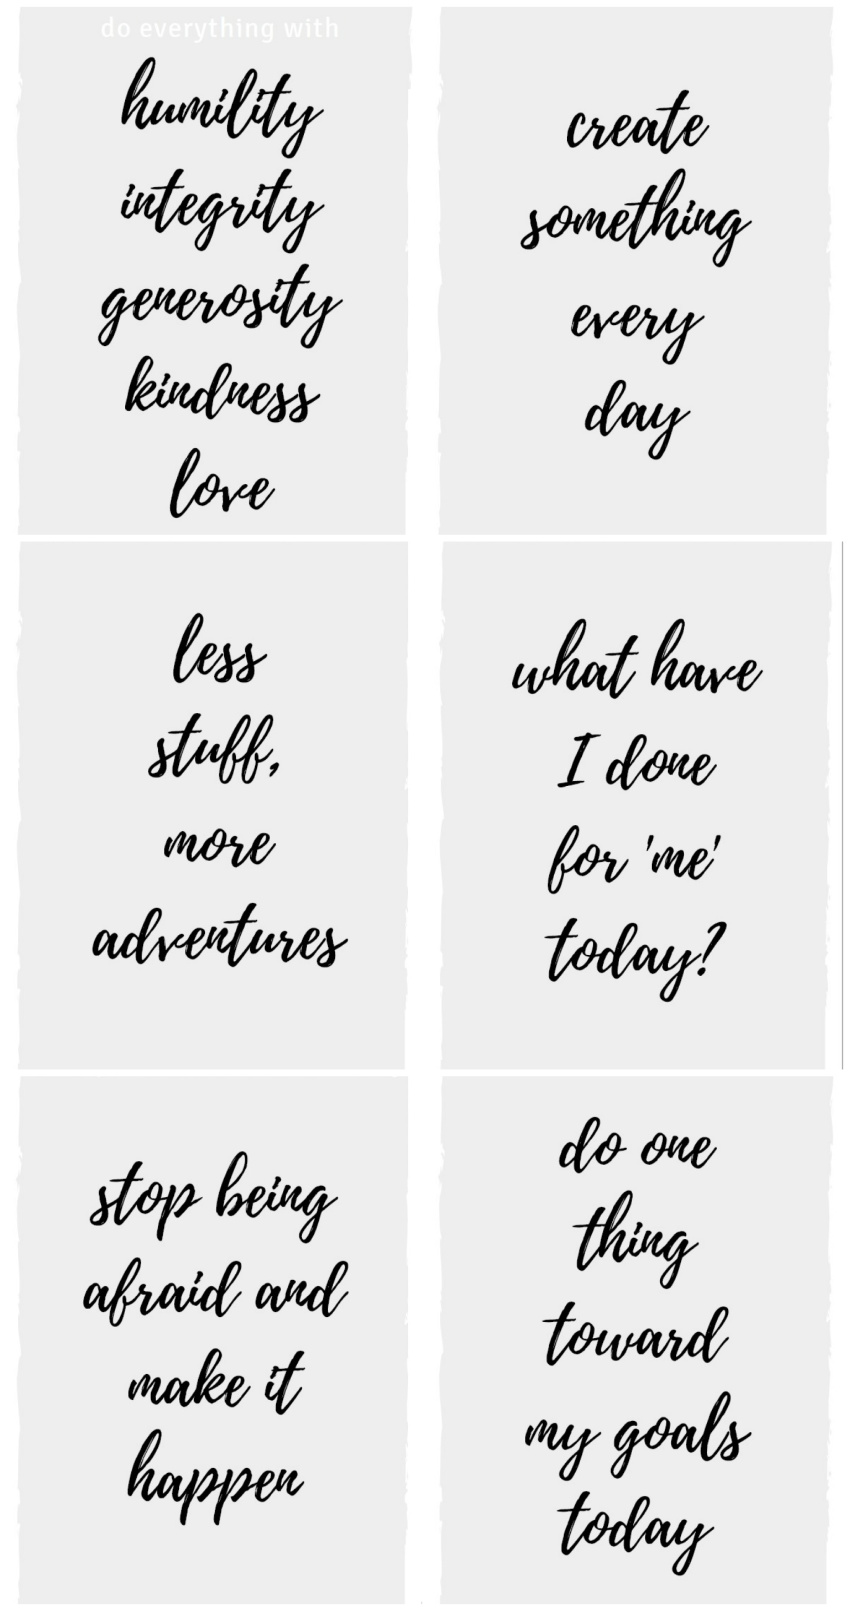 How To Create A Vision Board Tonya Staab